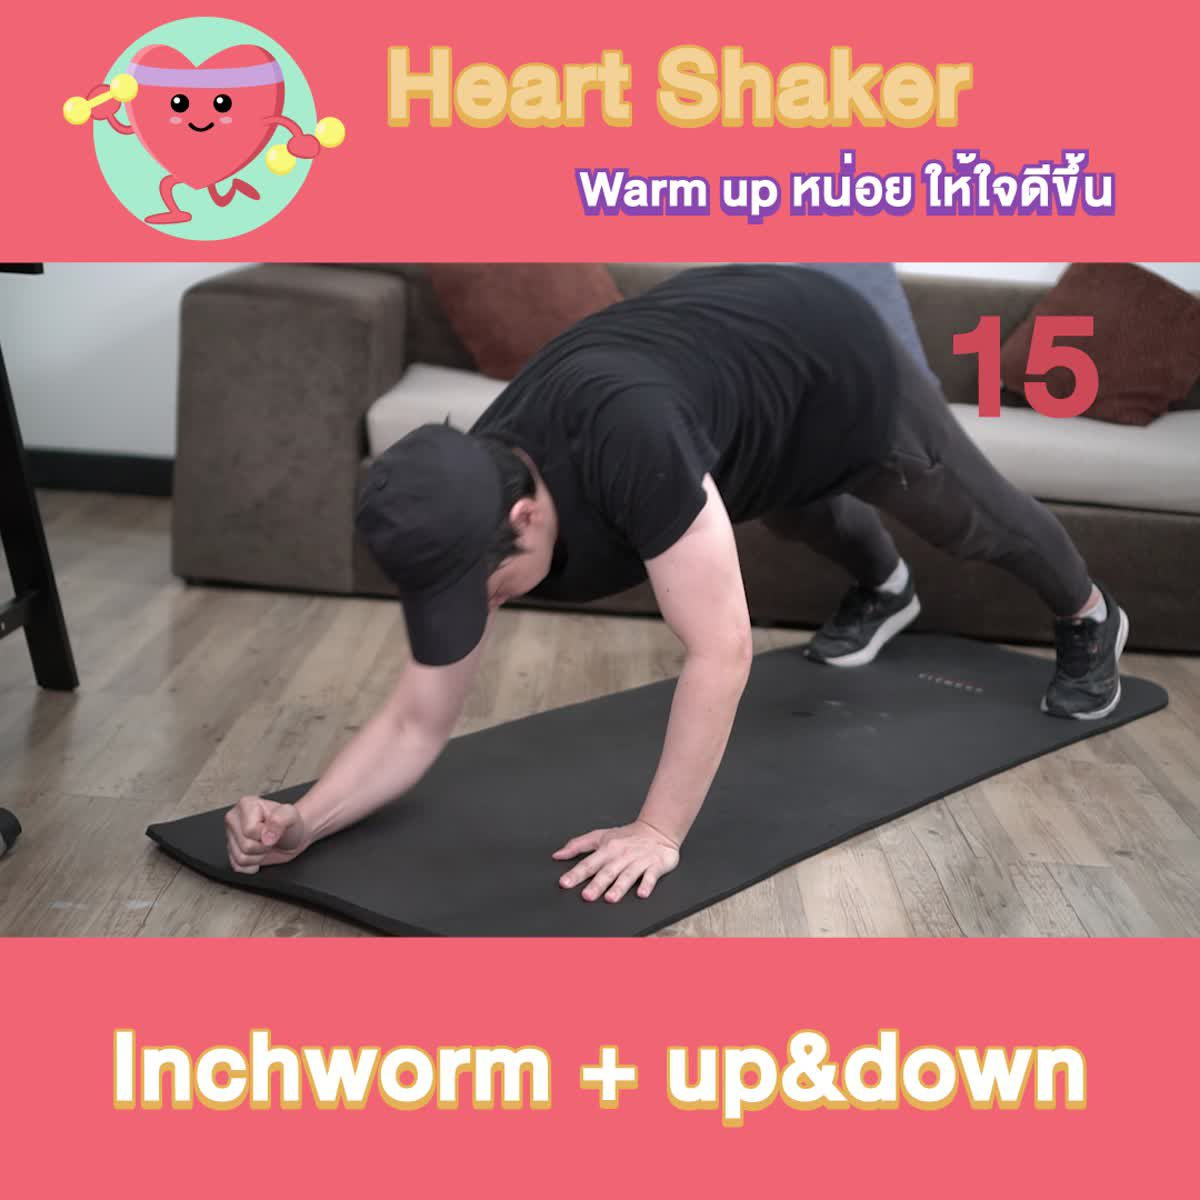 Heart shaker กับนายหุ่นล่ำ Ep.7 Warm up ให้หัวใจแข็งแรง